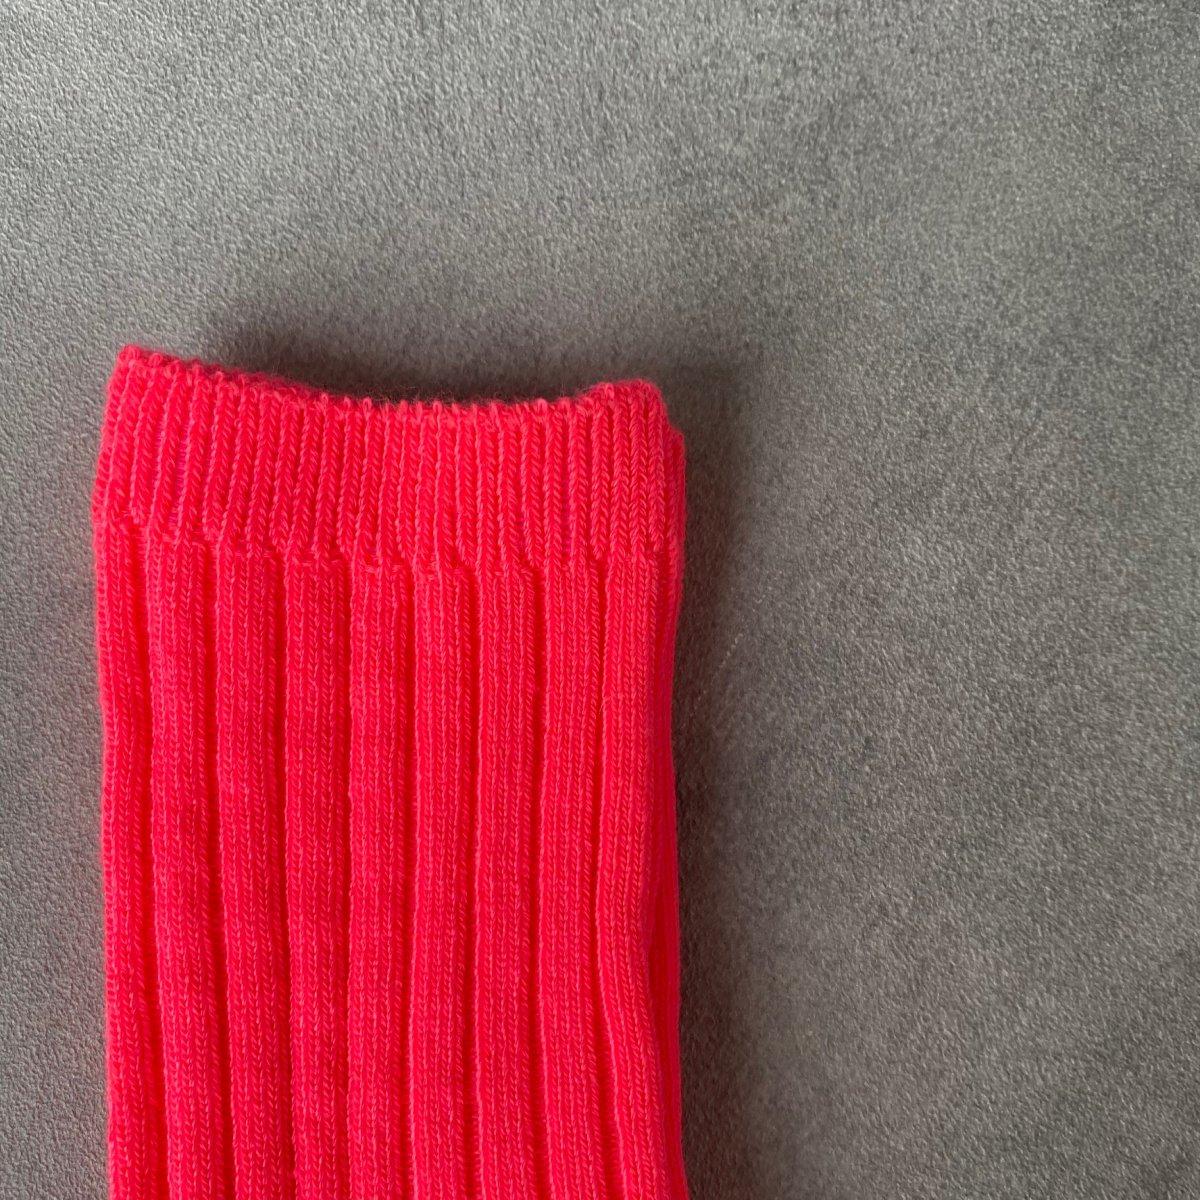 【BABY】Neon Socks 詳細画像12